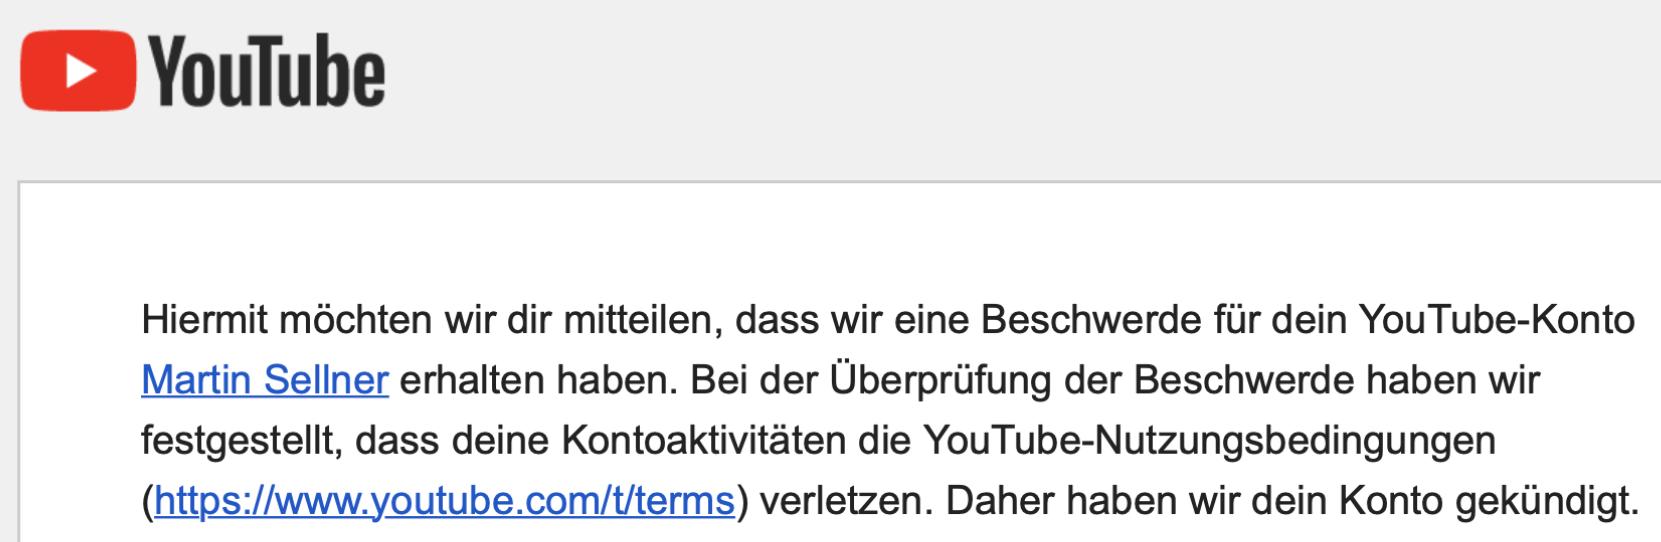 YouTube kündigt Martin Sellners Account